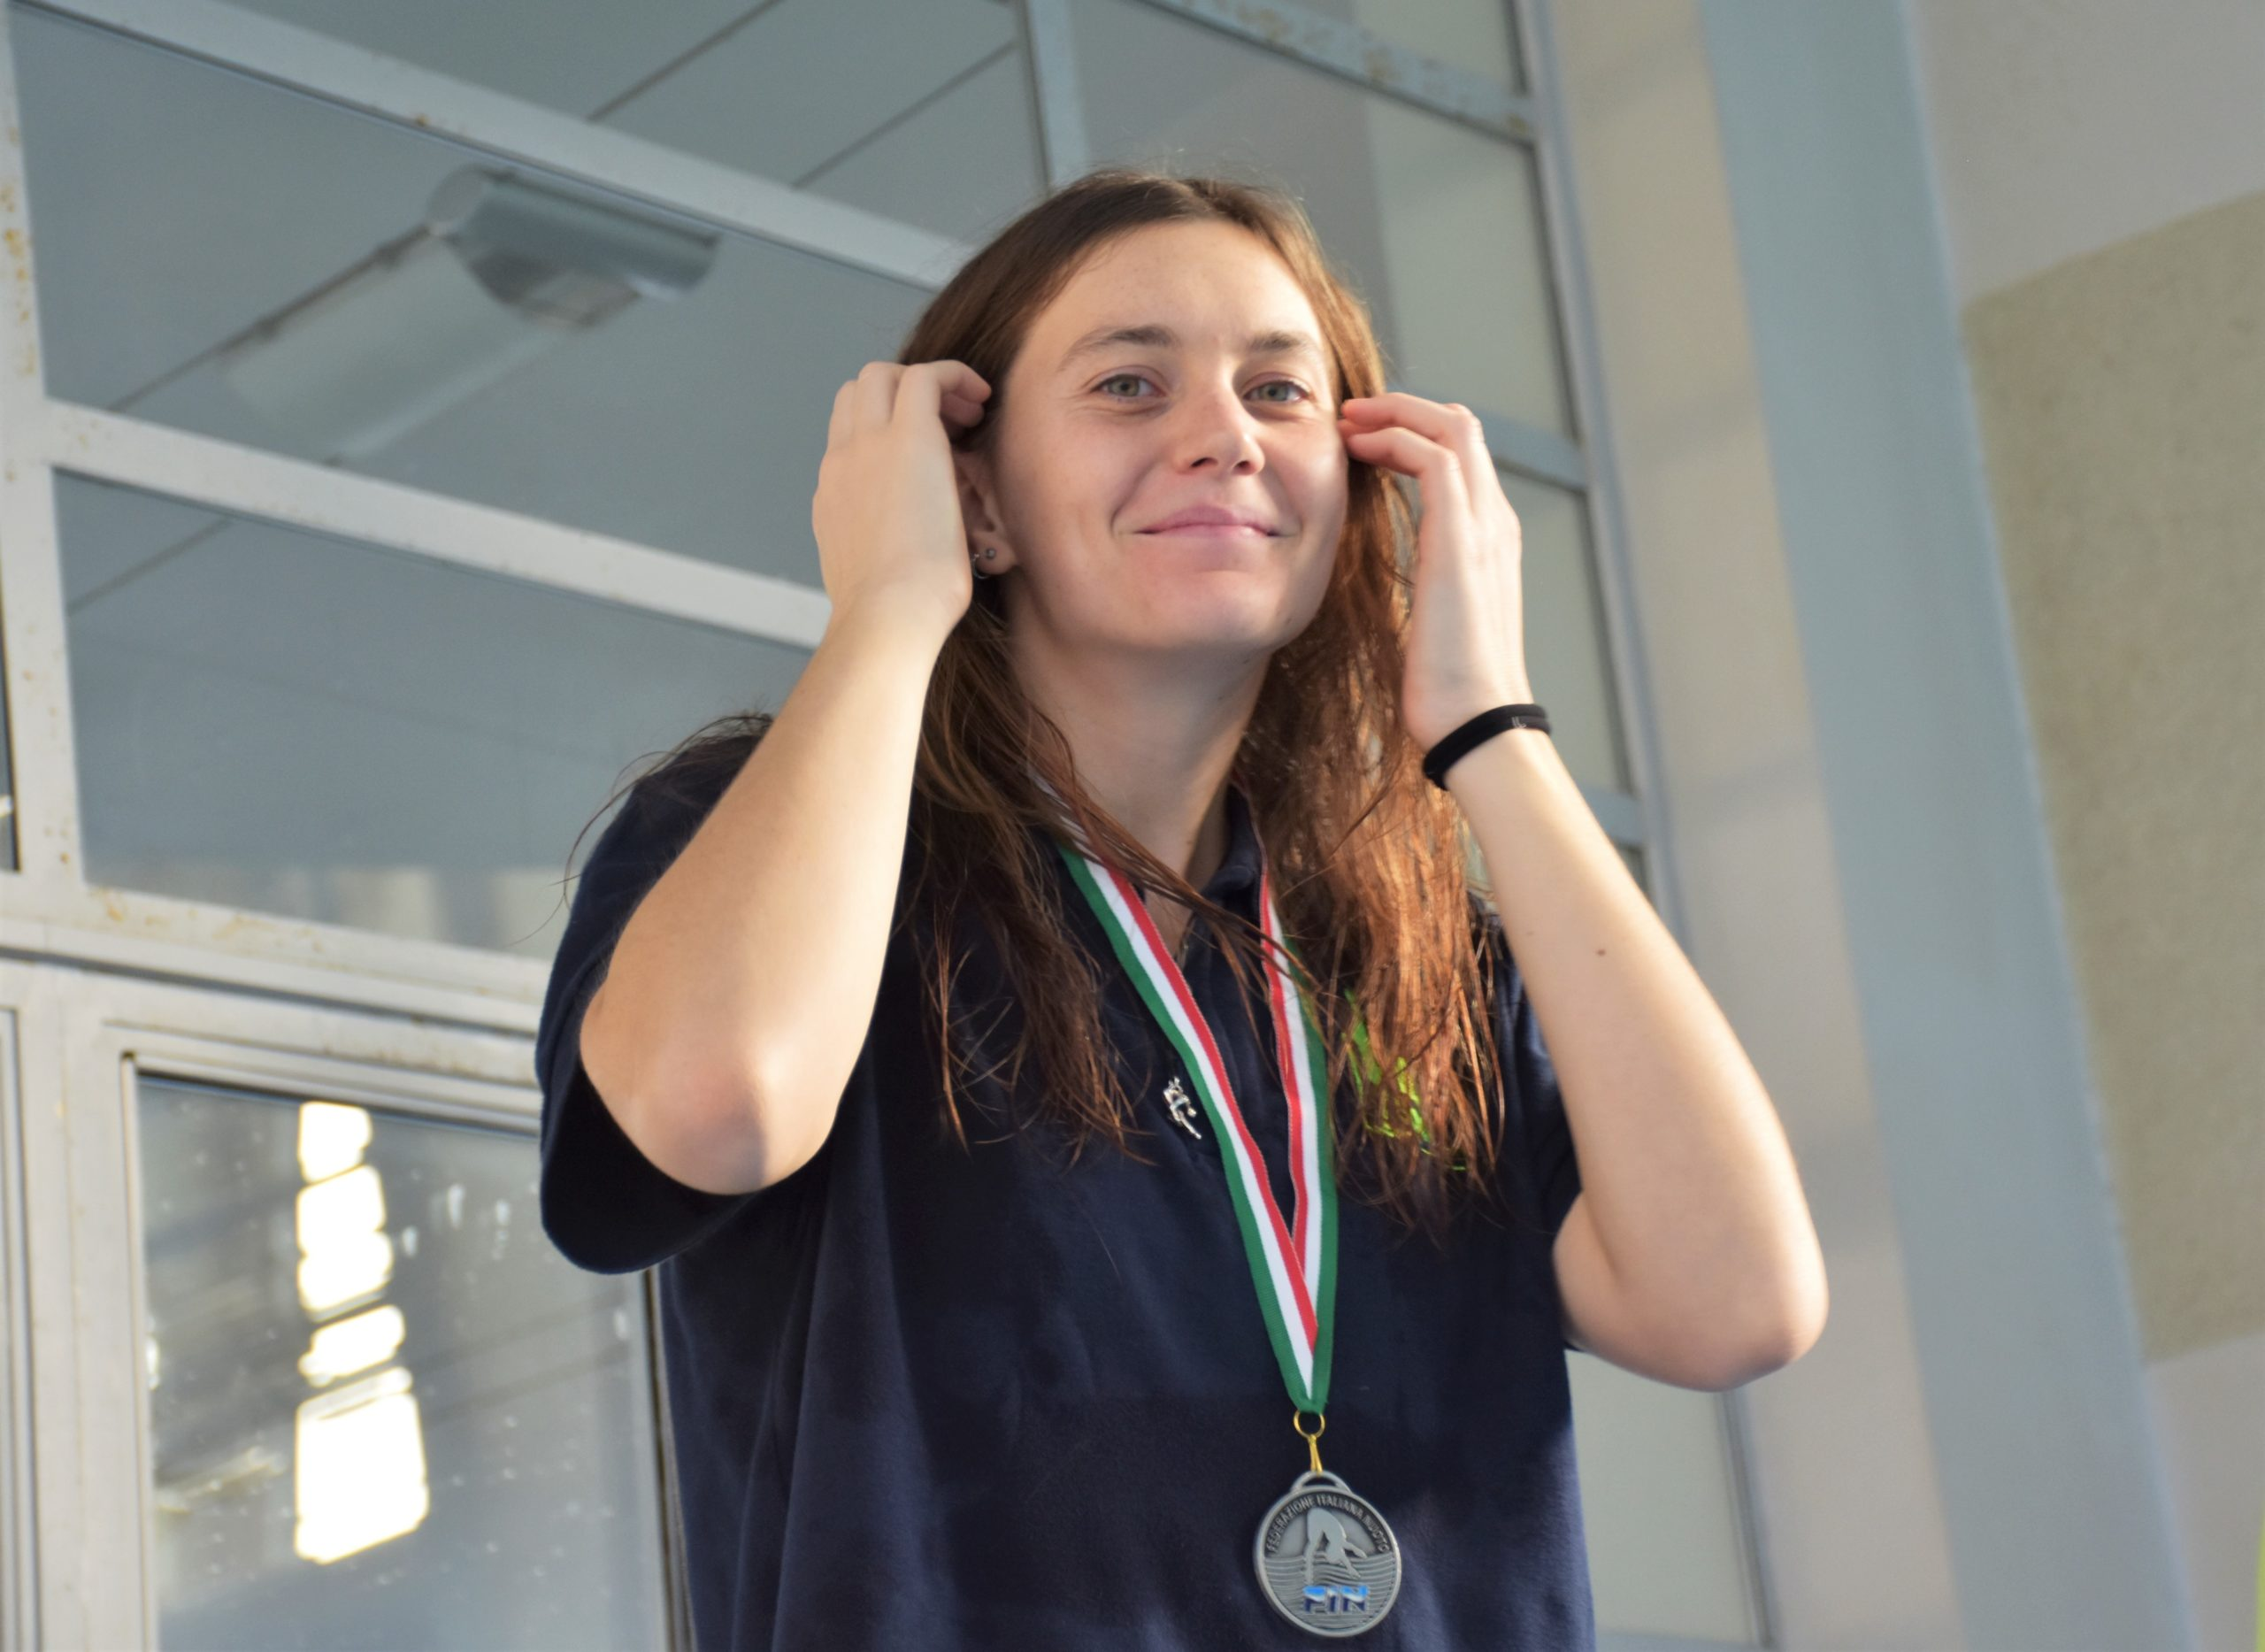 Carolina Sbarigia (MR Sport) ha vinto la medaglia d'argento nella gara da un metro